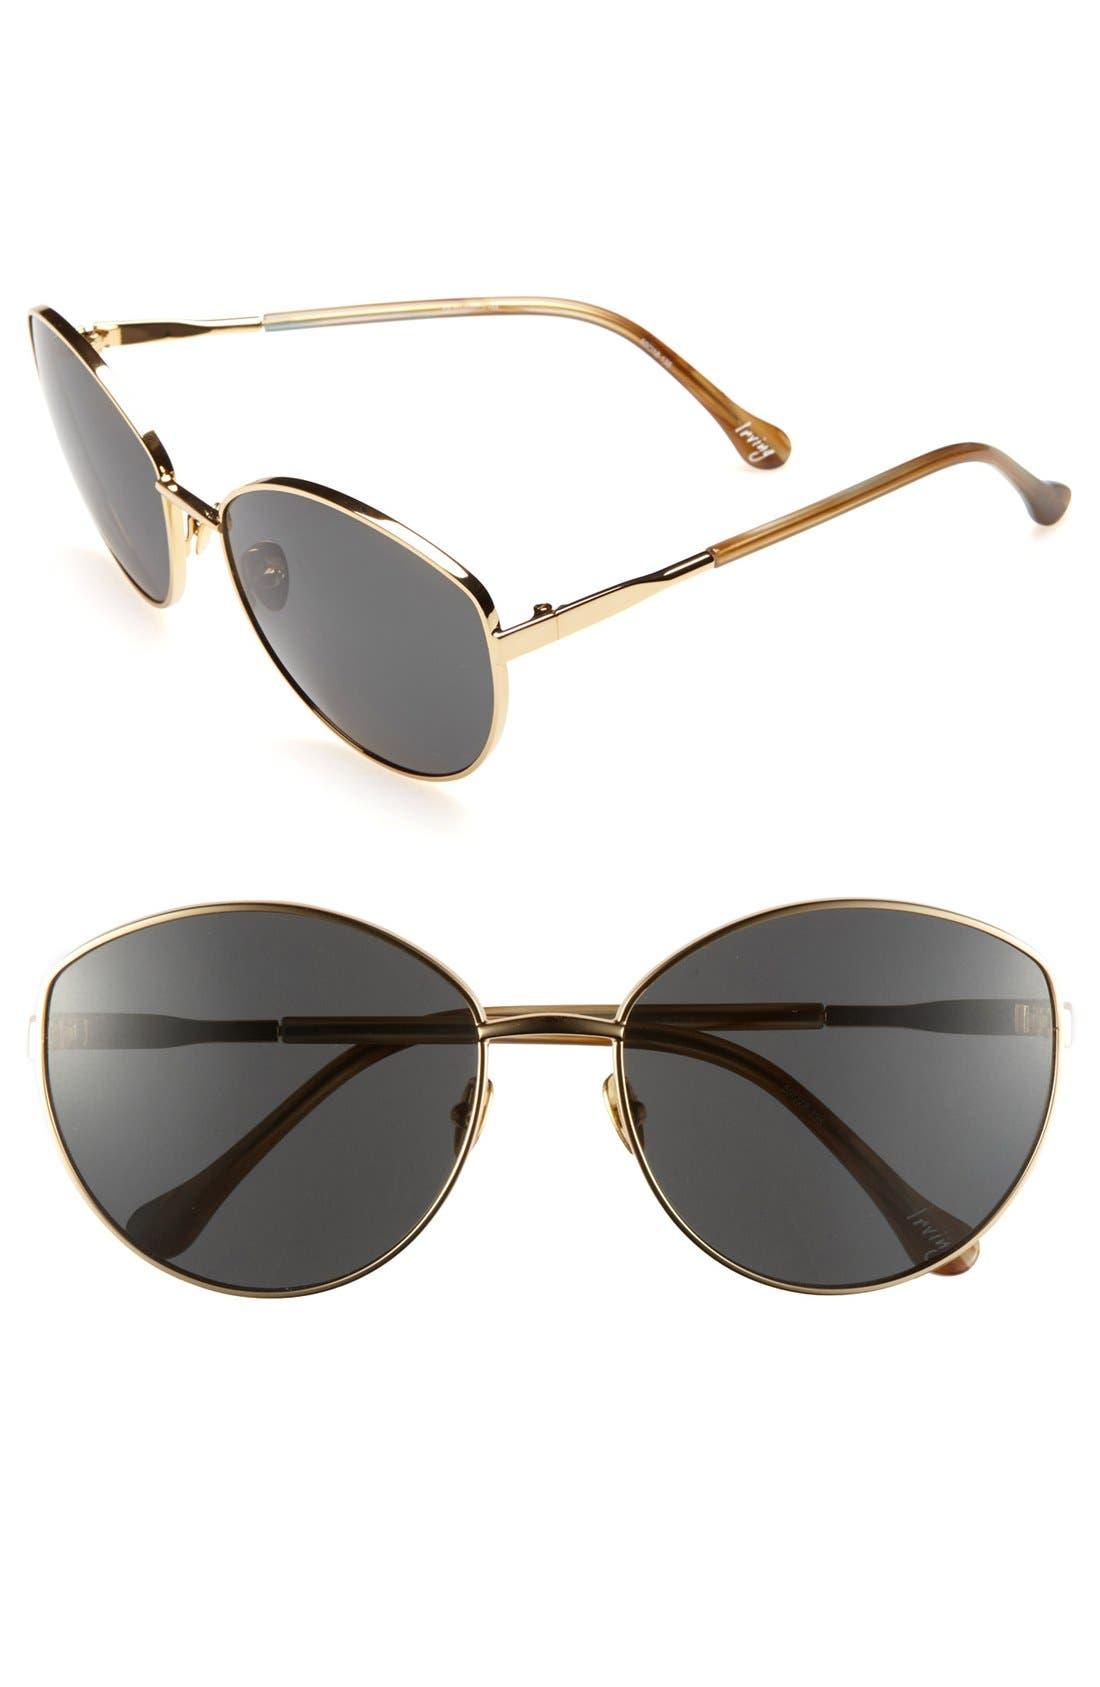 Main Image - Elizabeth and James 'Irving' 59mm Sunglasses